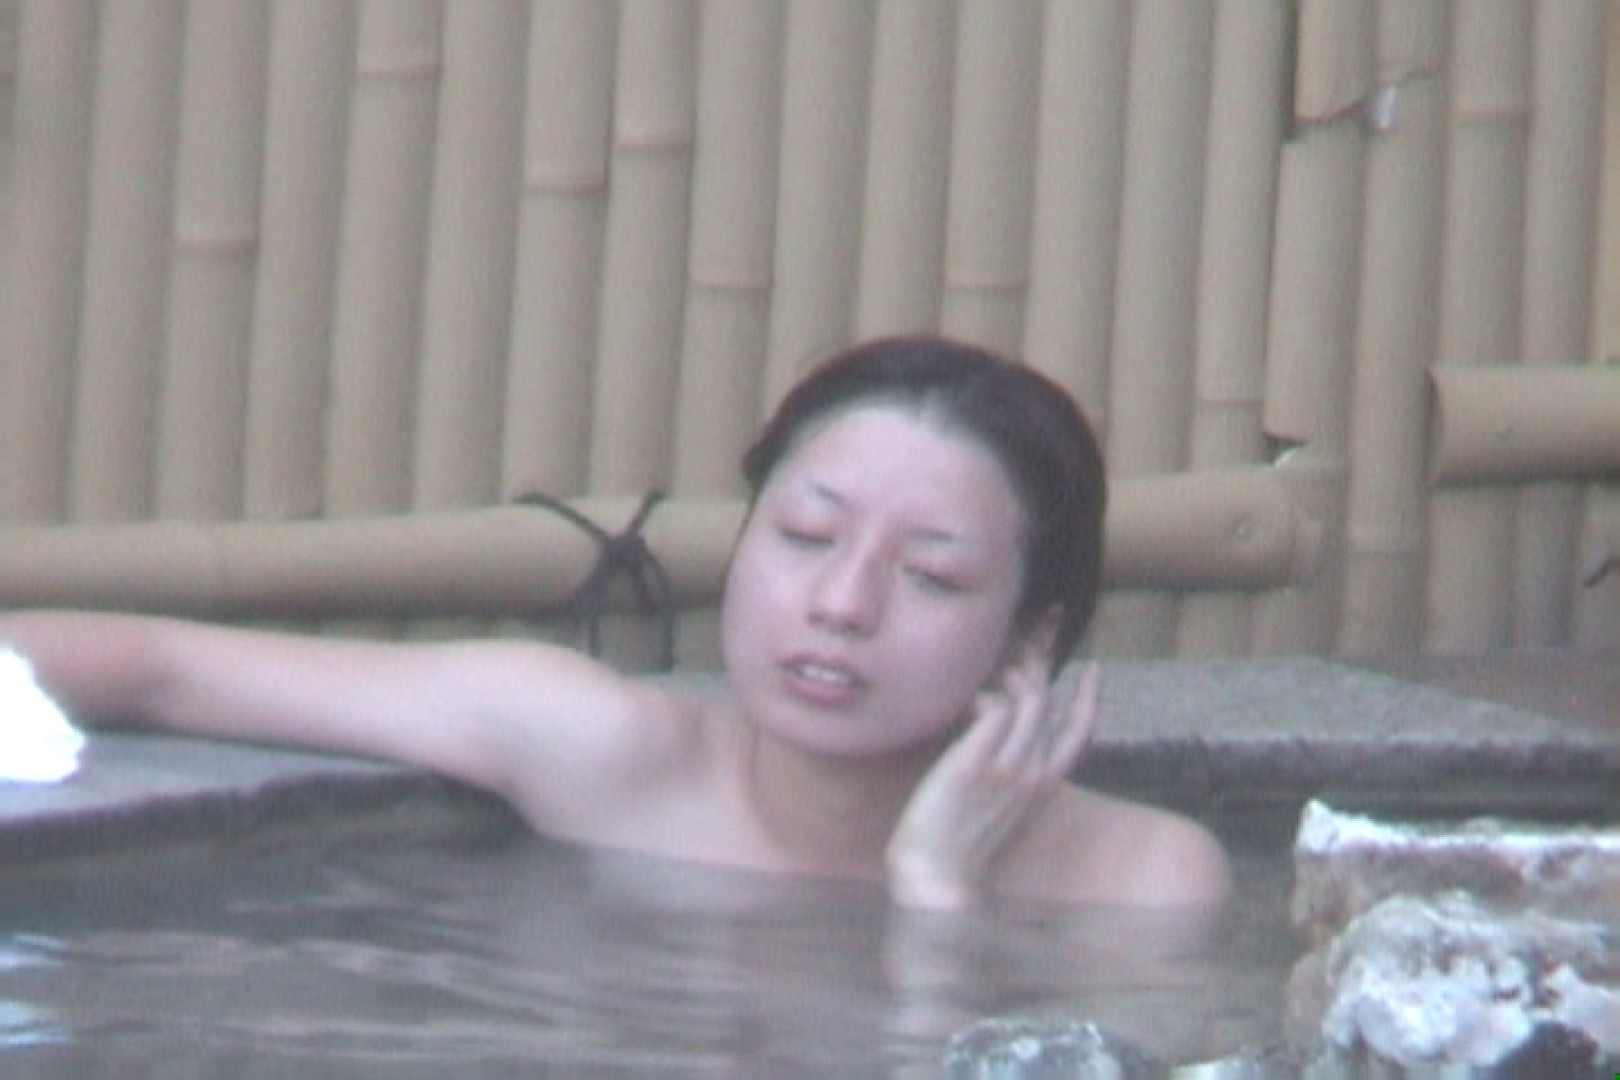 Aquaな露天風呂Vol.608 露天風呂 | OLのエロ生活  69連発 52